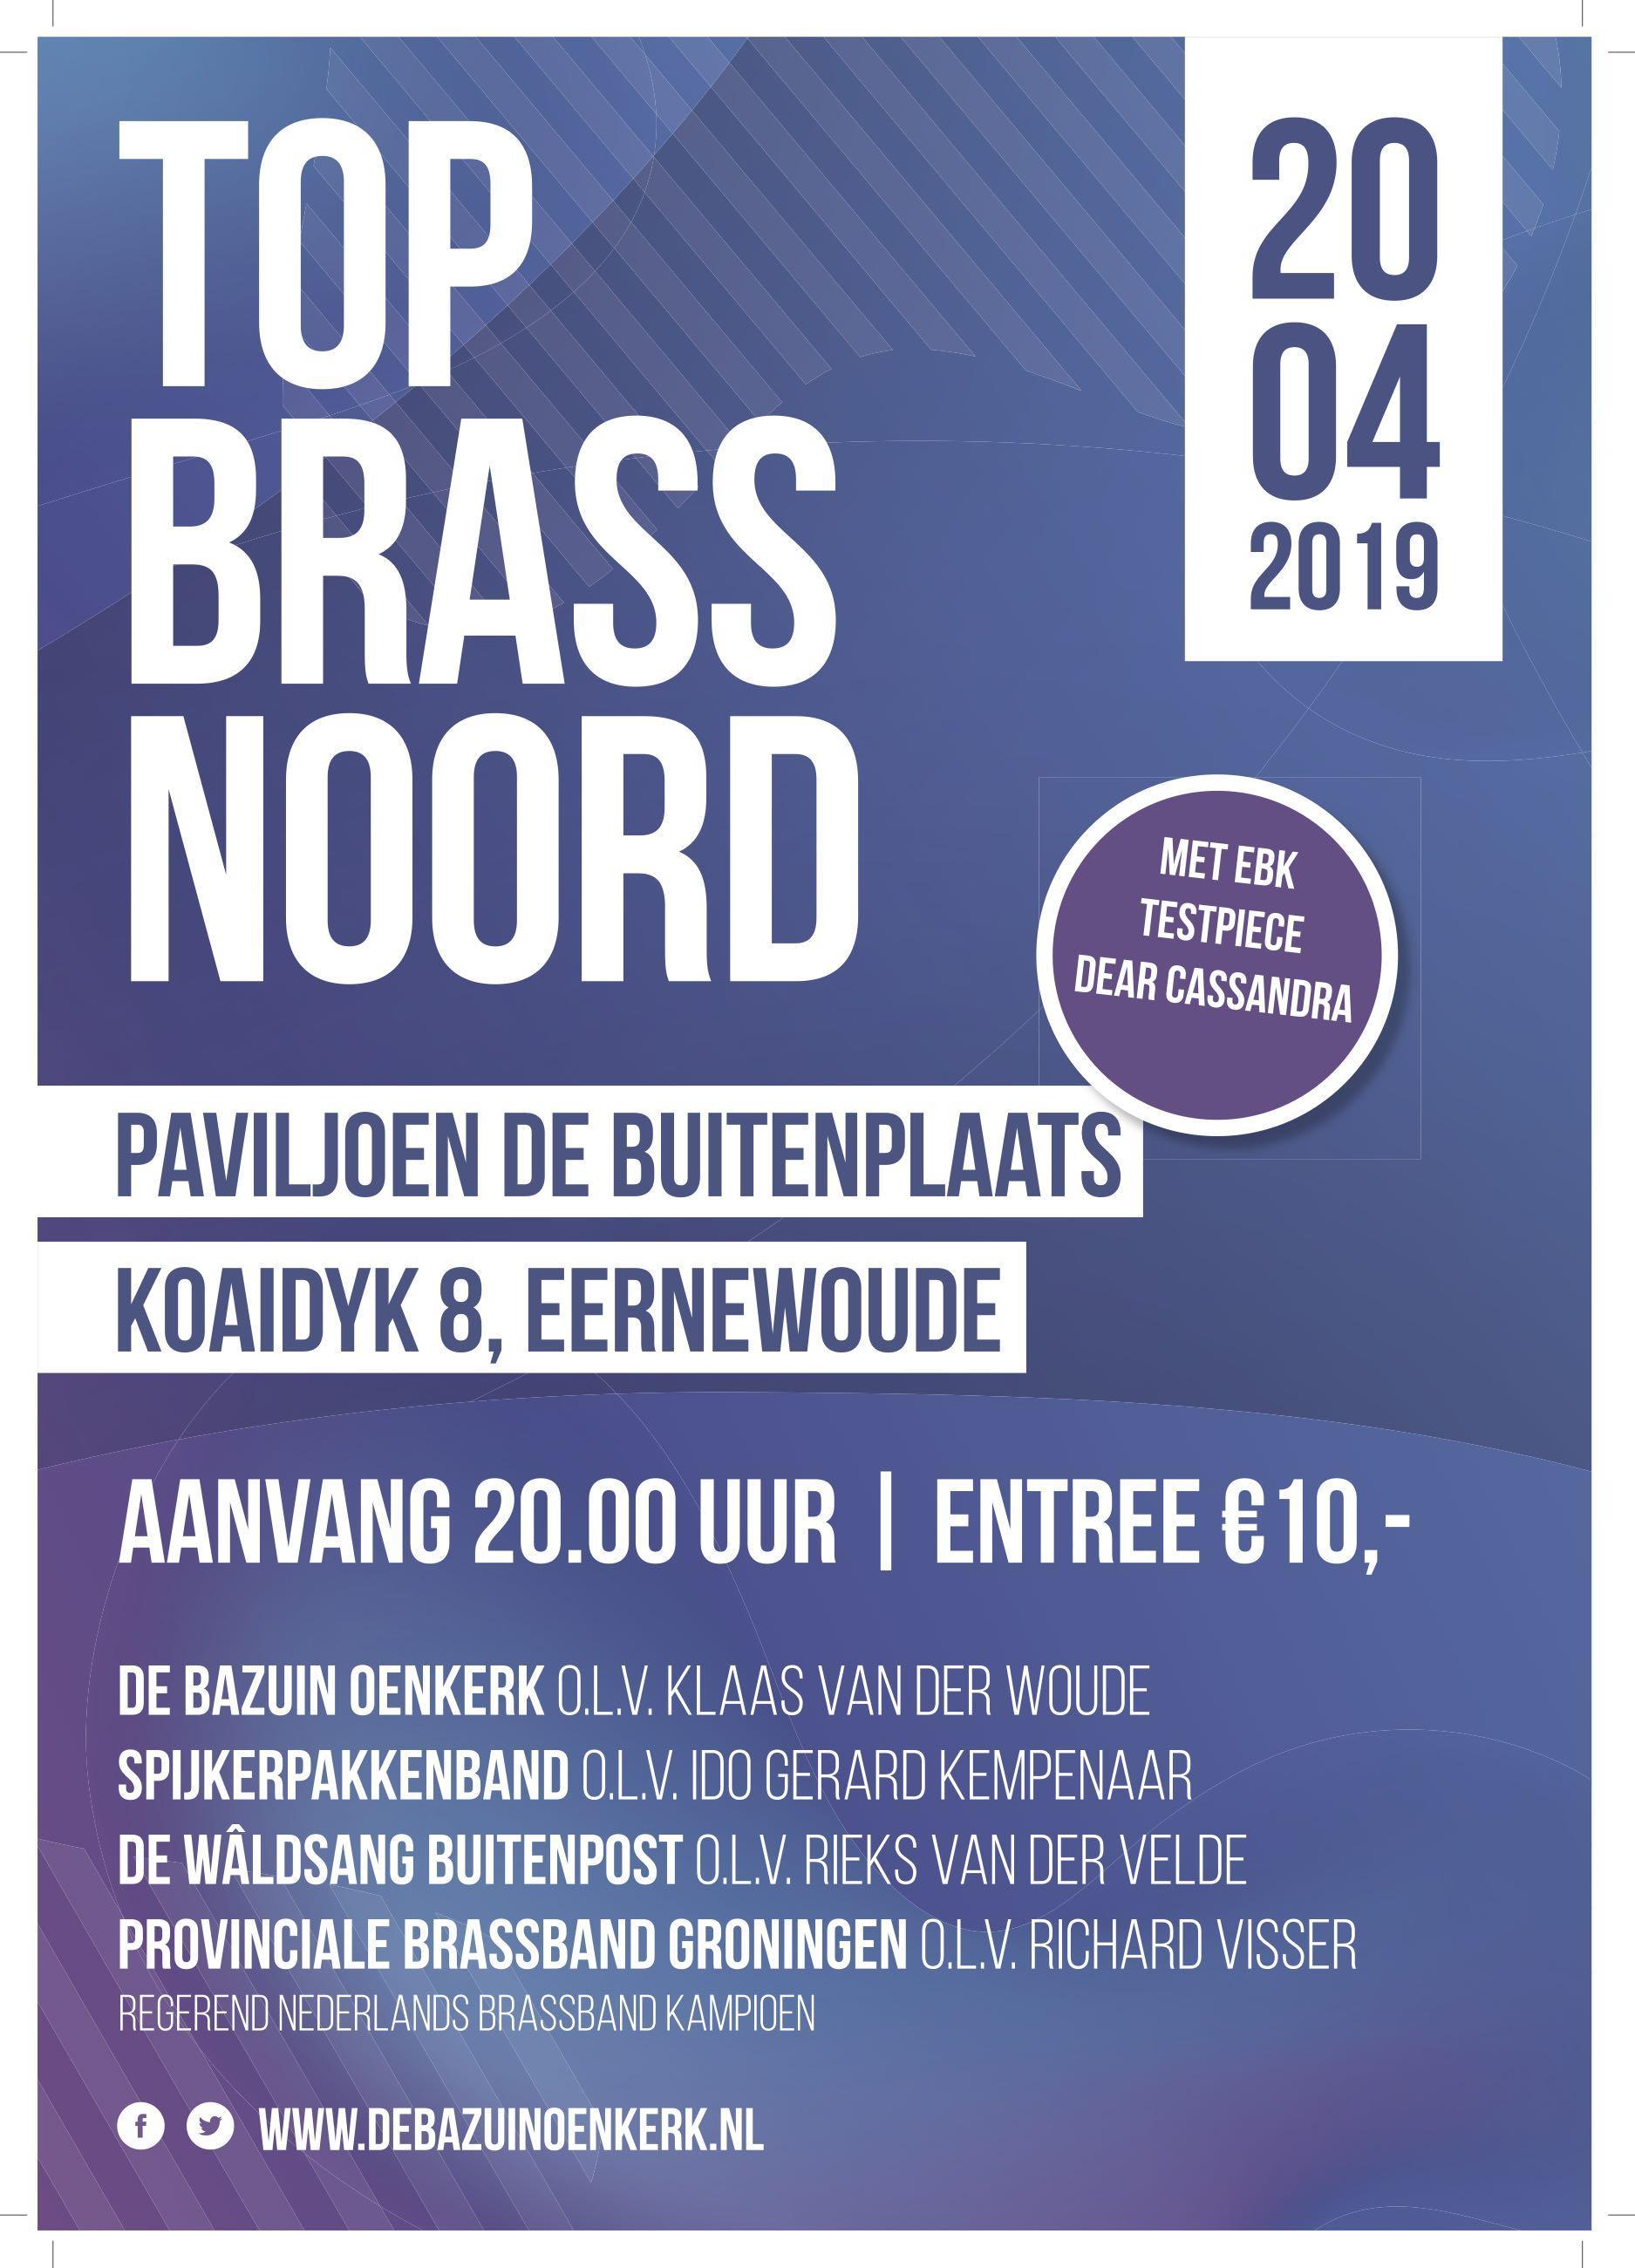 Top_Brass_Noord_DrukA3.2.jpg#asset:860